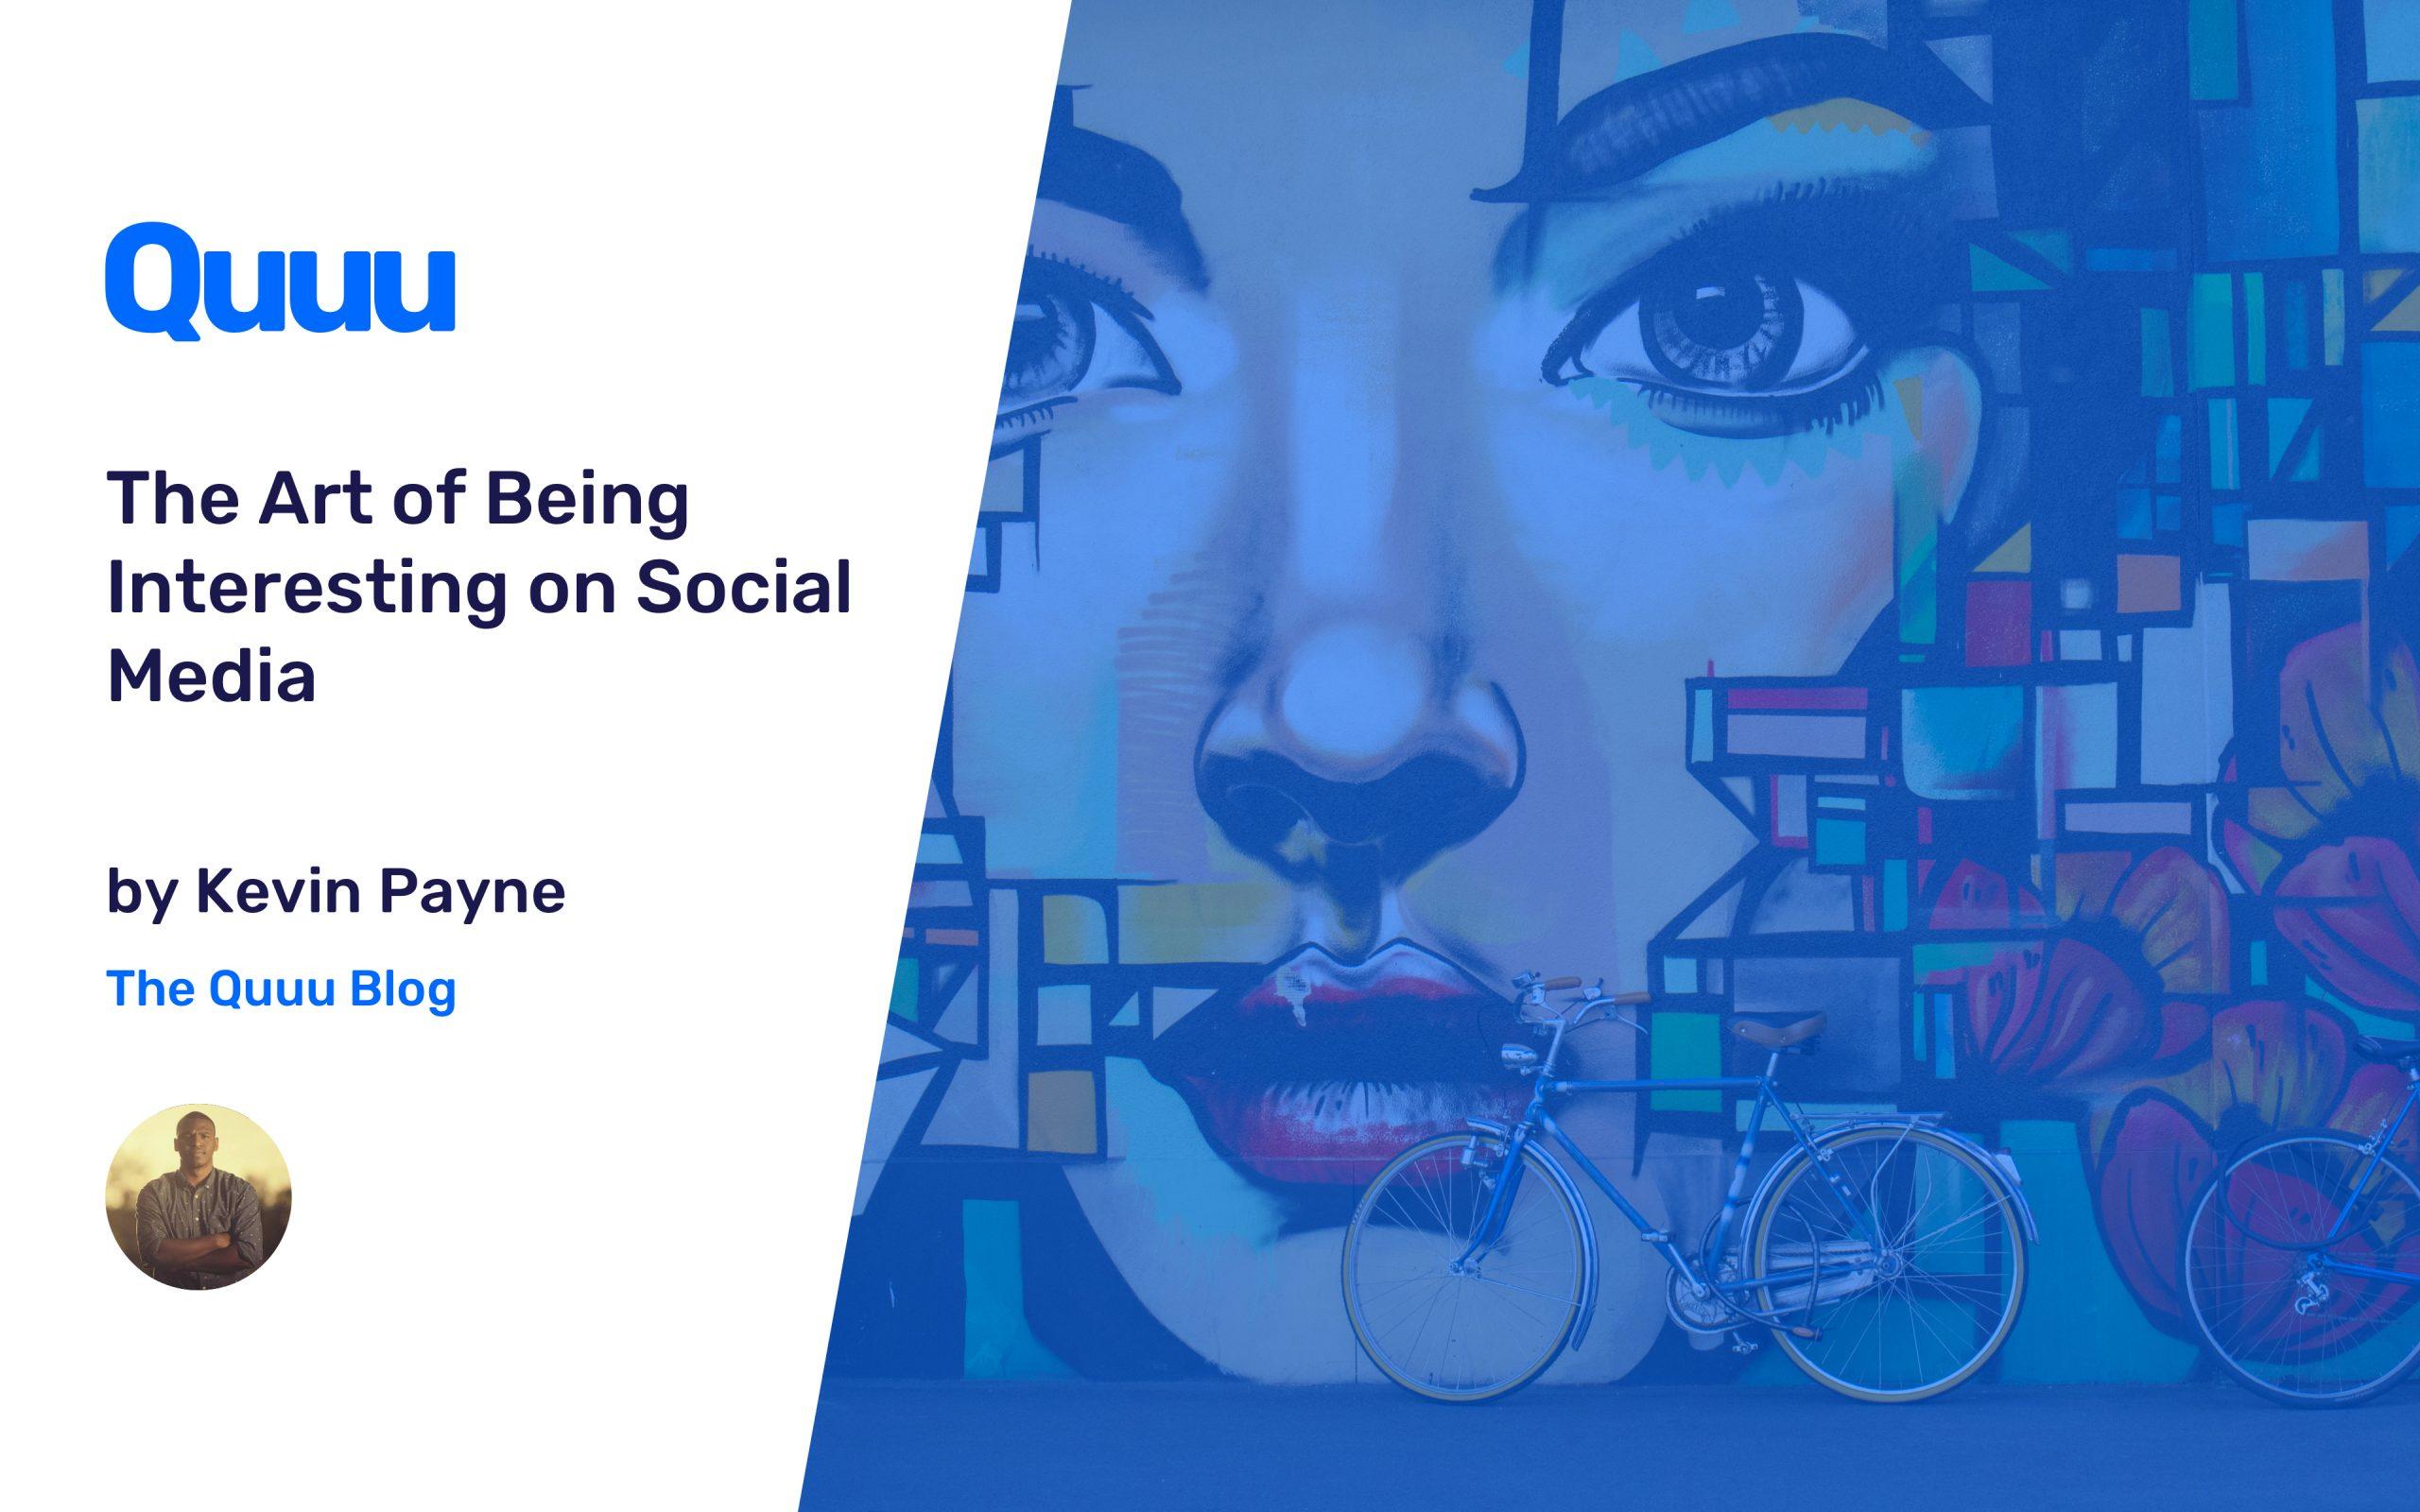 The Art of Being Interesting on Social Media